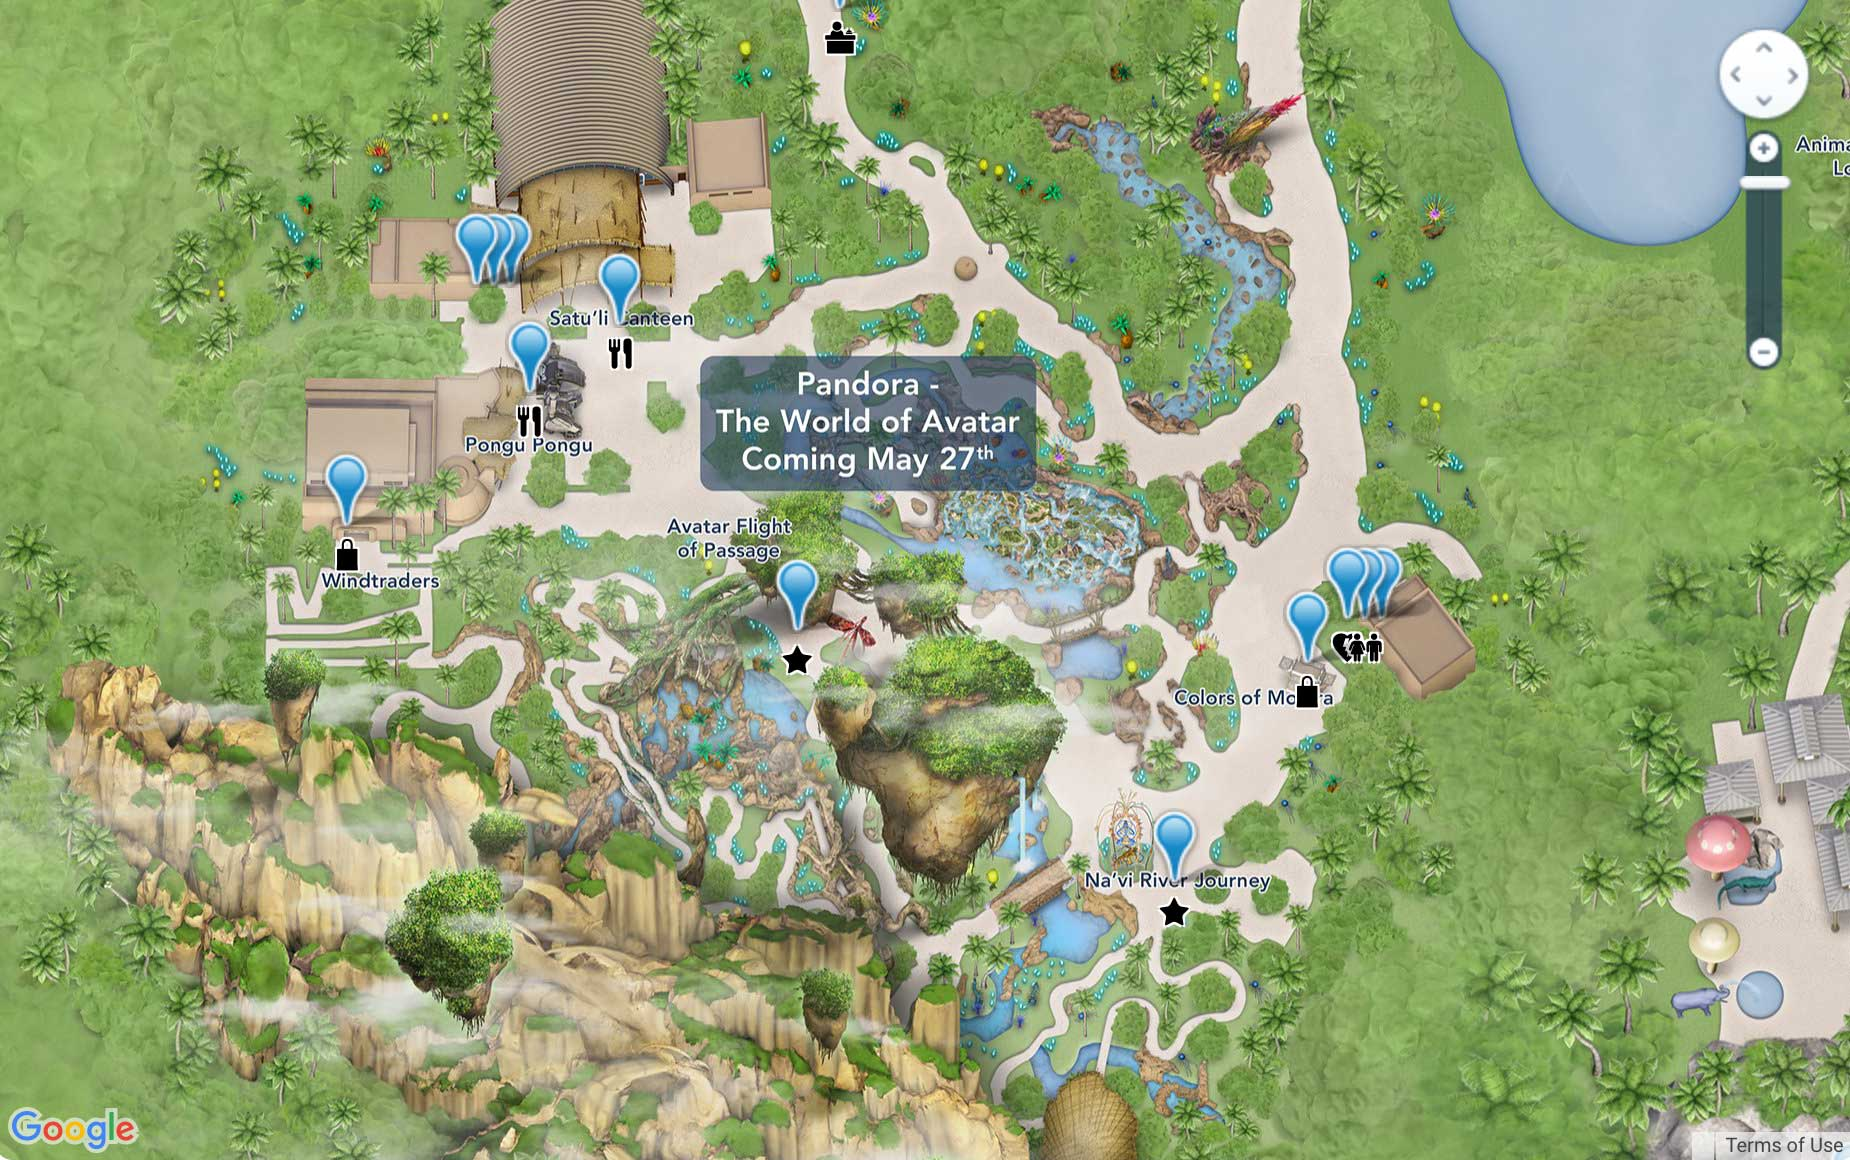 Pandora - The World of Avatar map